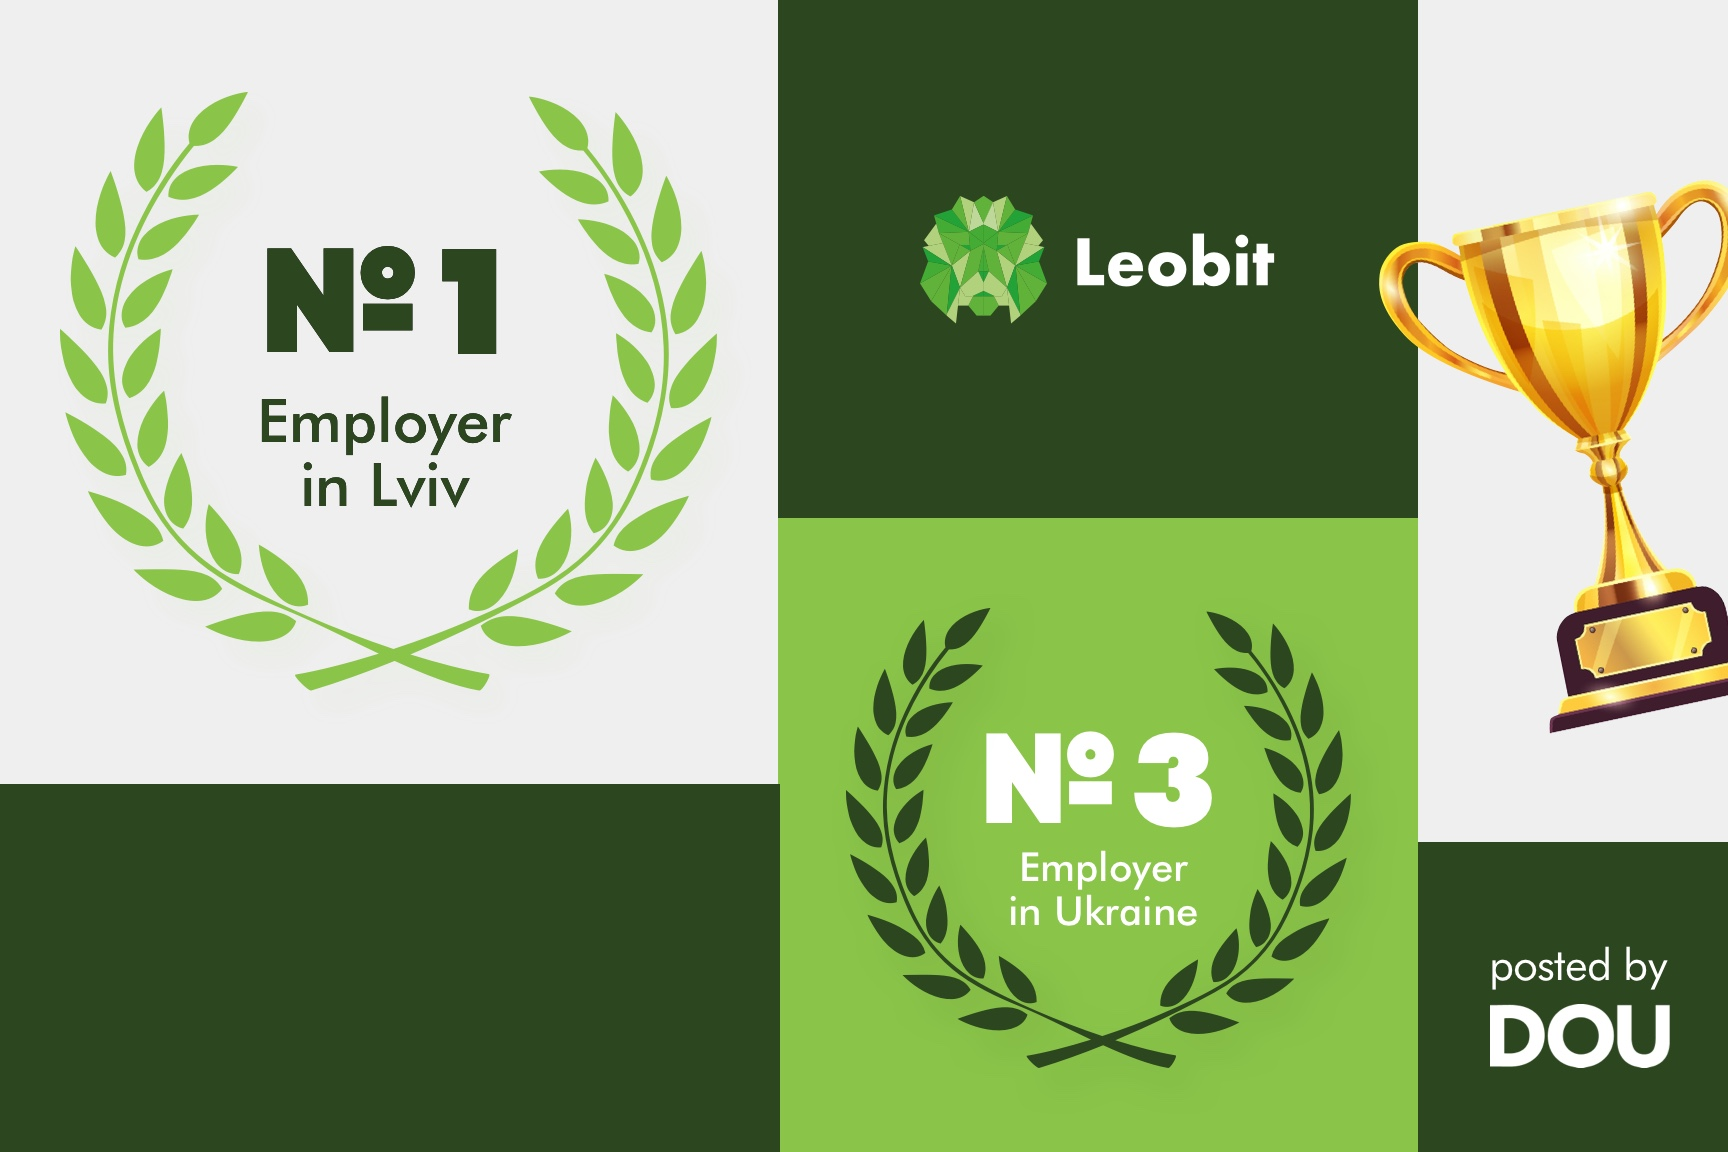 Leobit named best IT employer by DOU